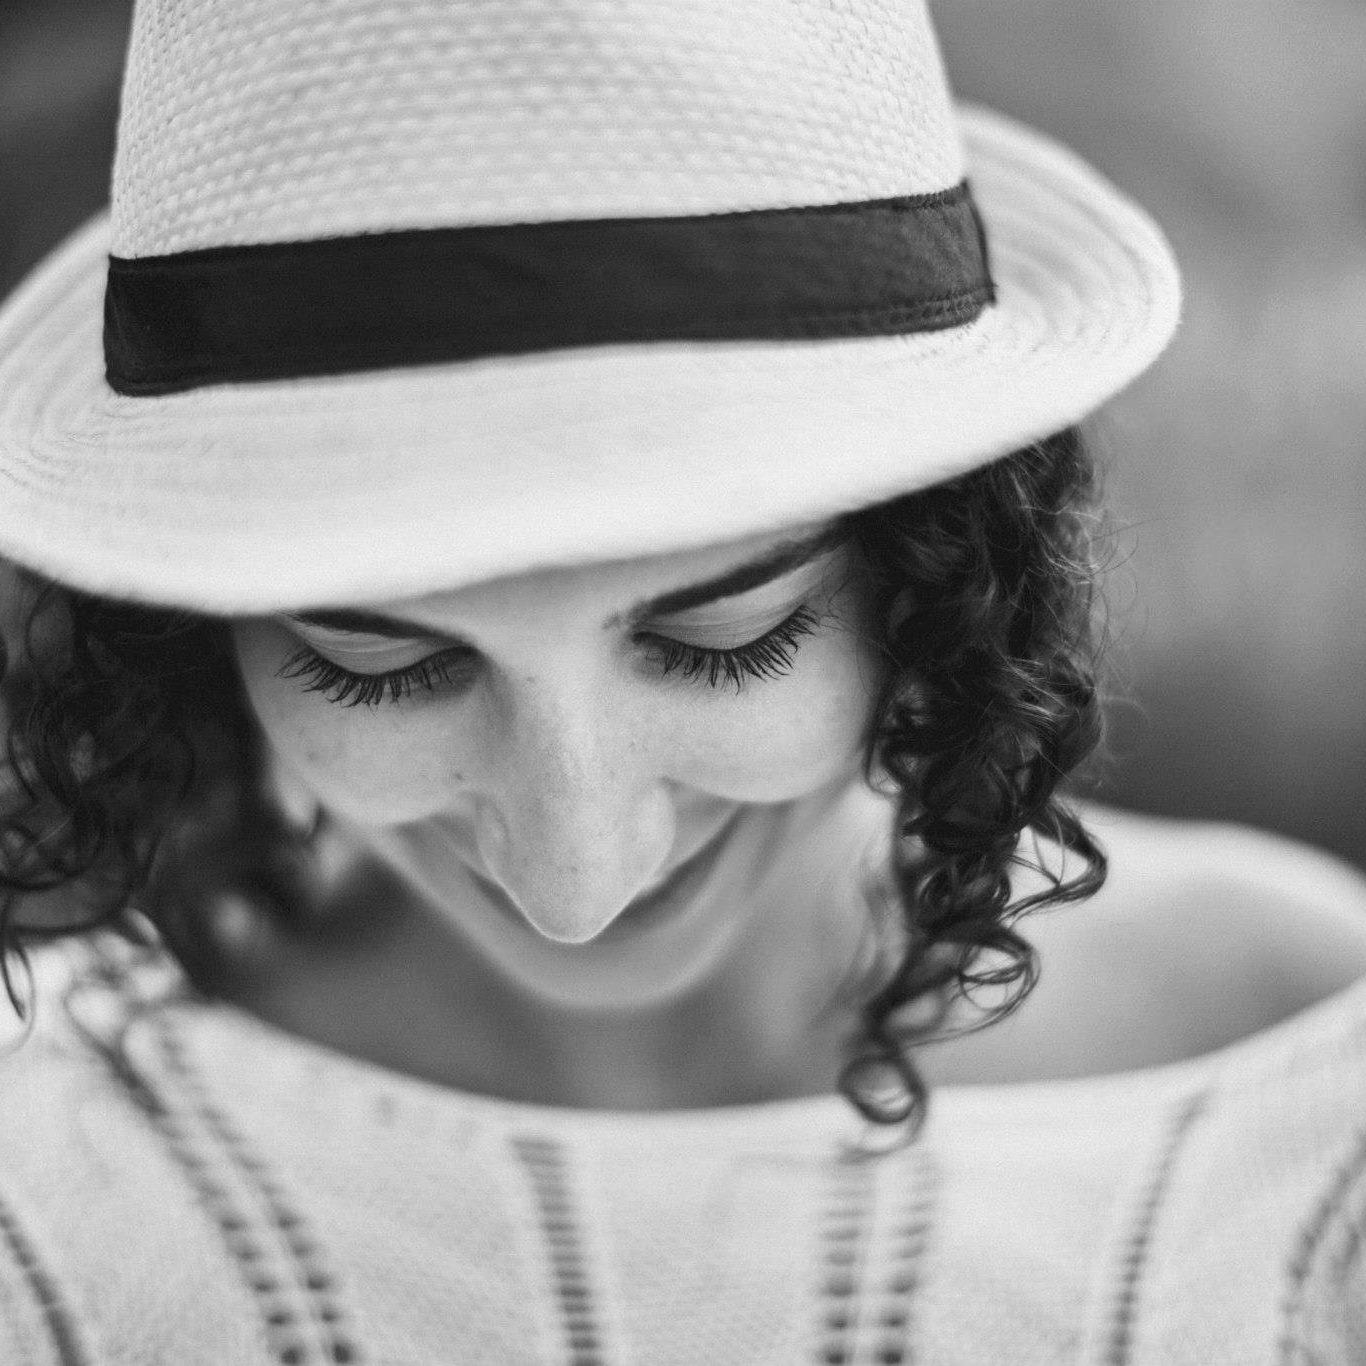 About Aline Moreno - Fotografia Lifestyle de Familias - Curitiba